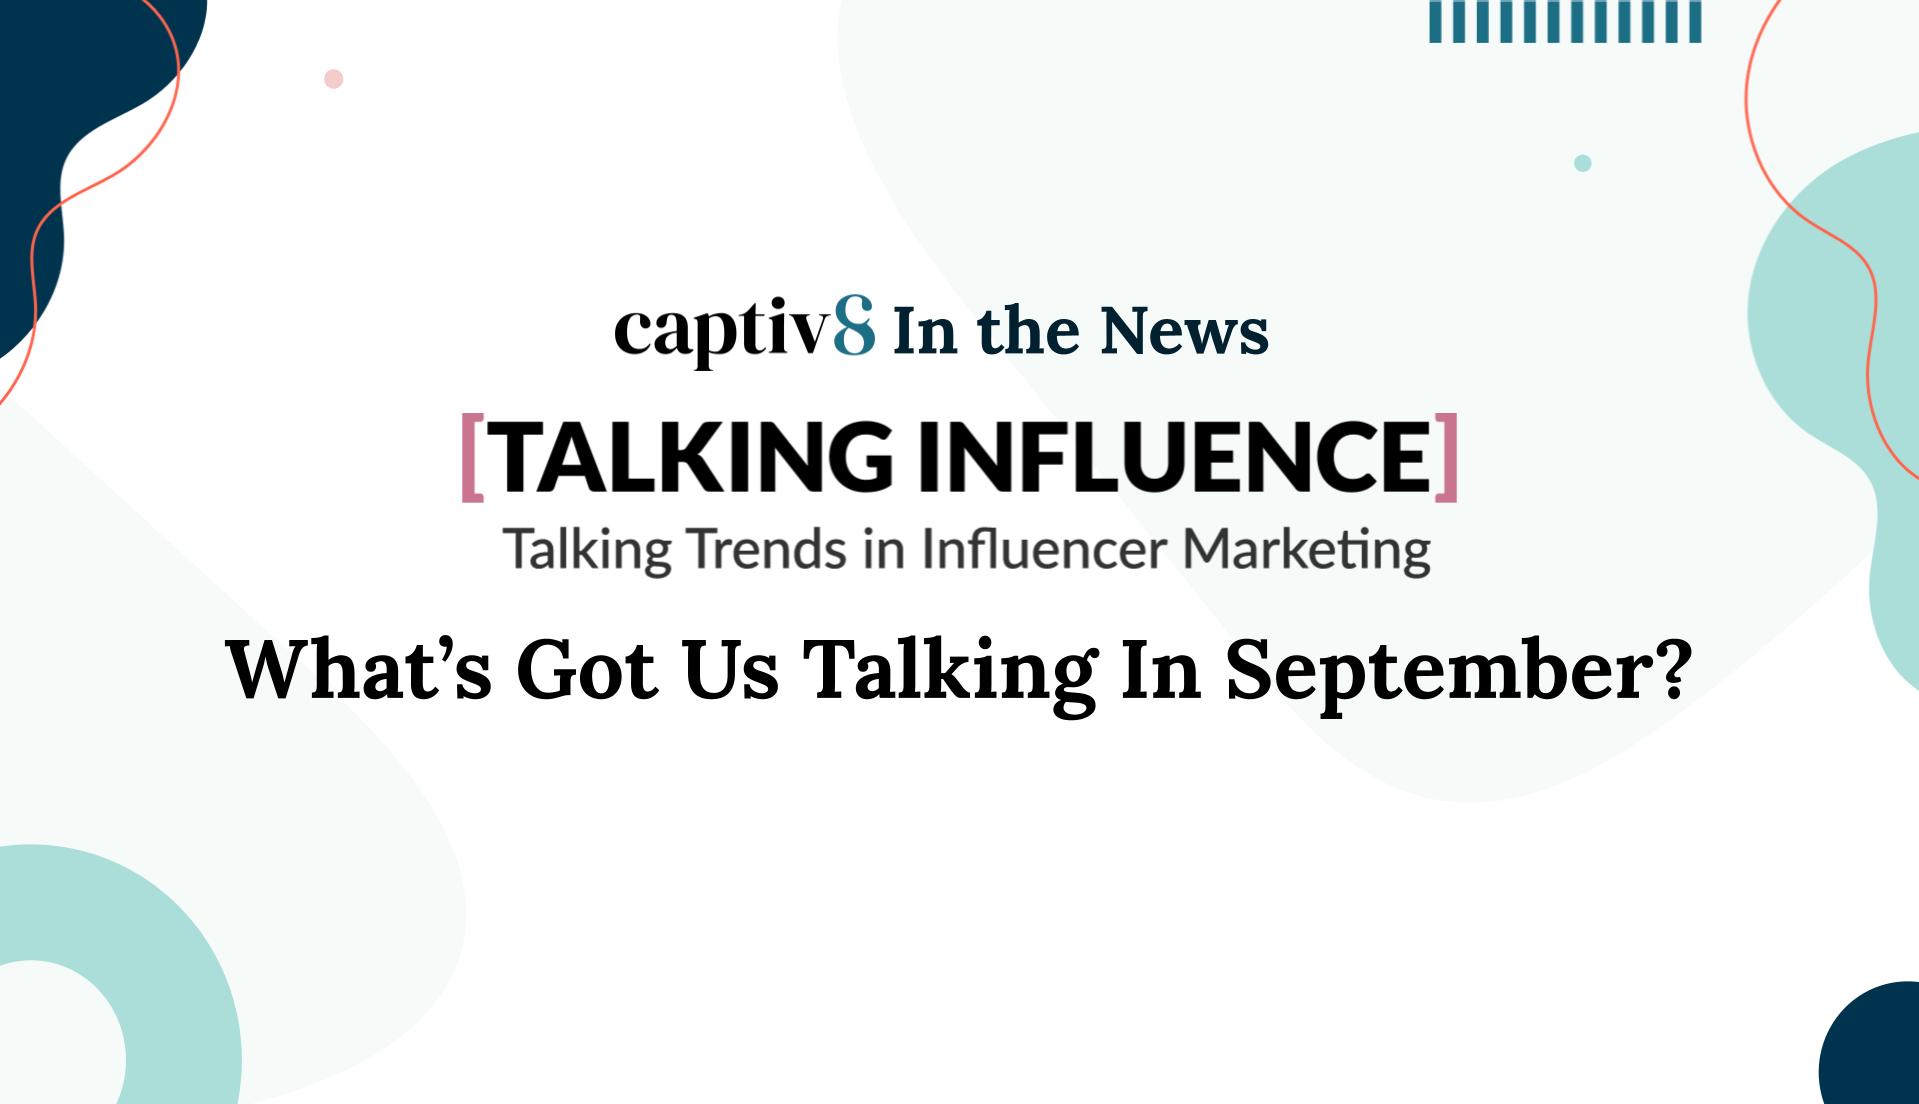 TalkingInfluenceBanner_9.30